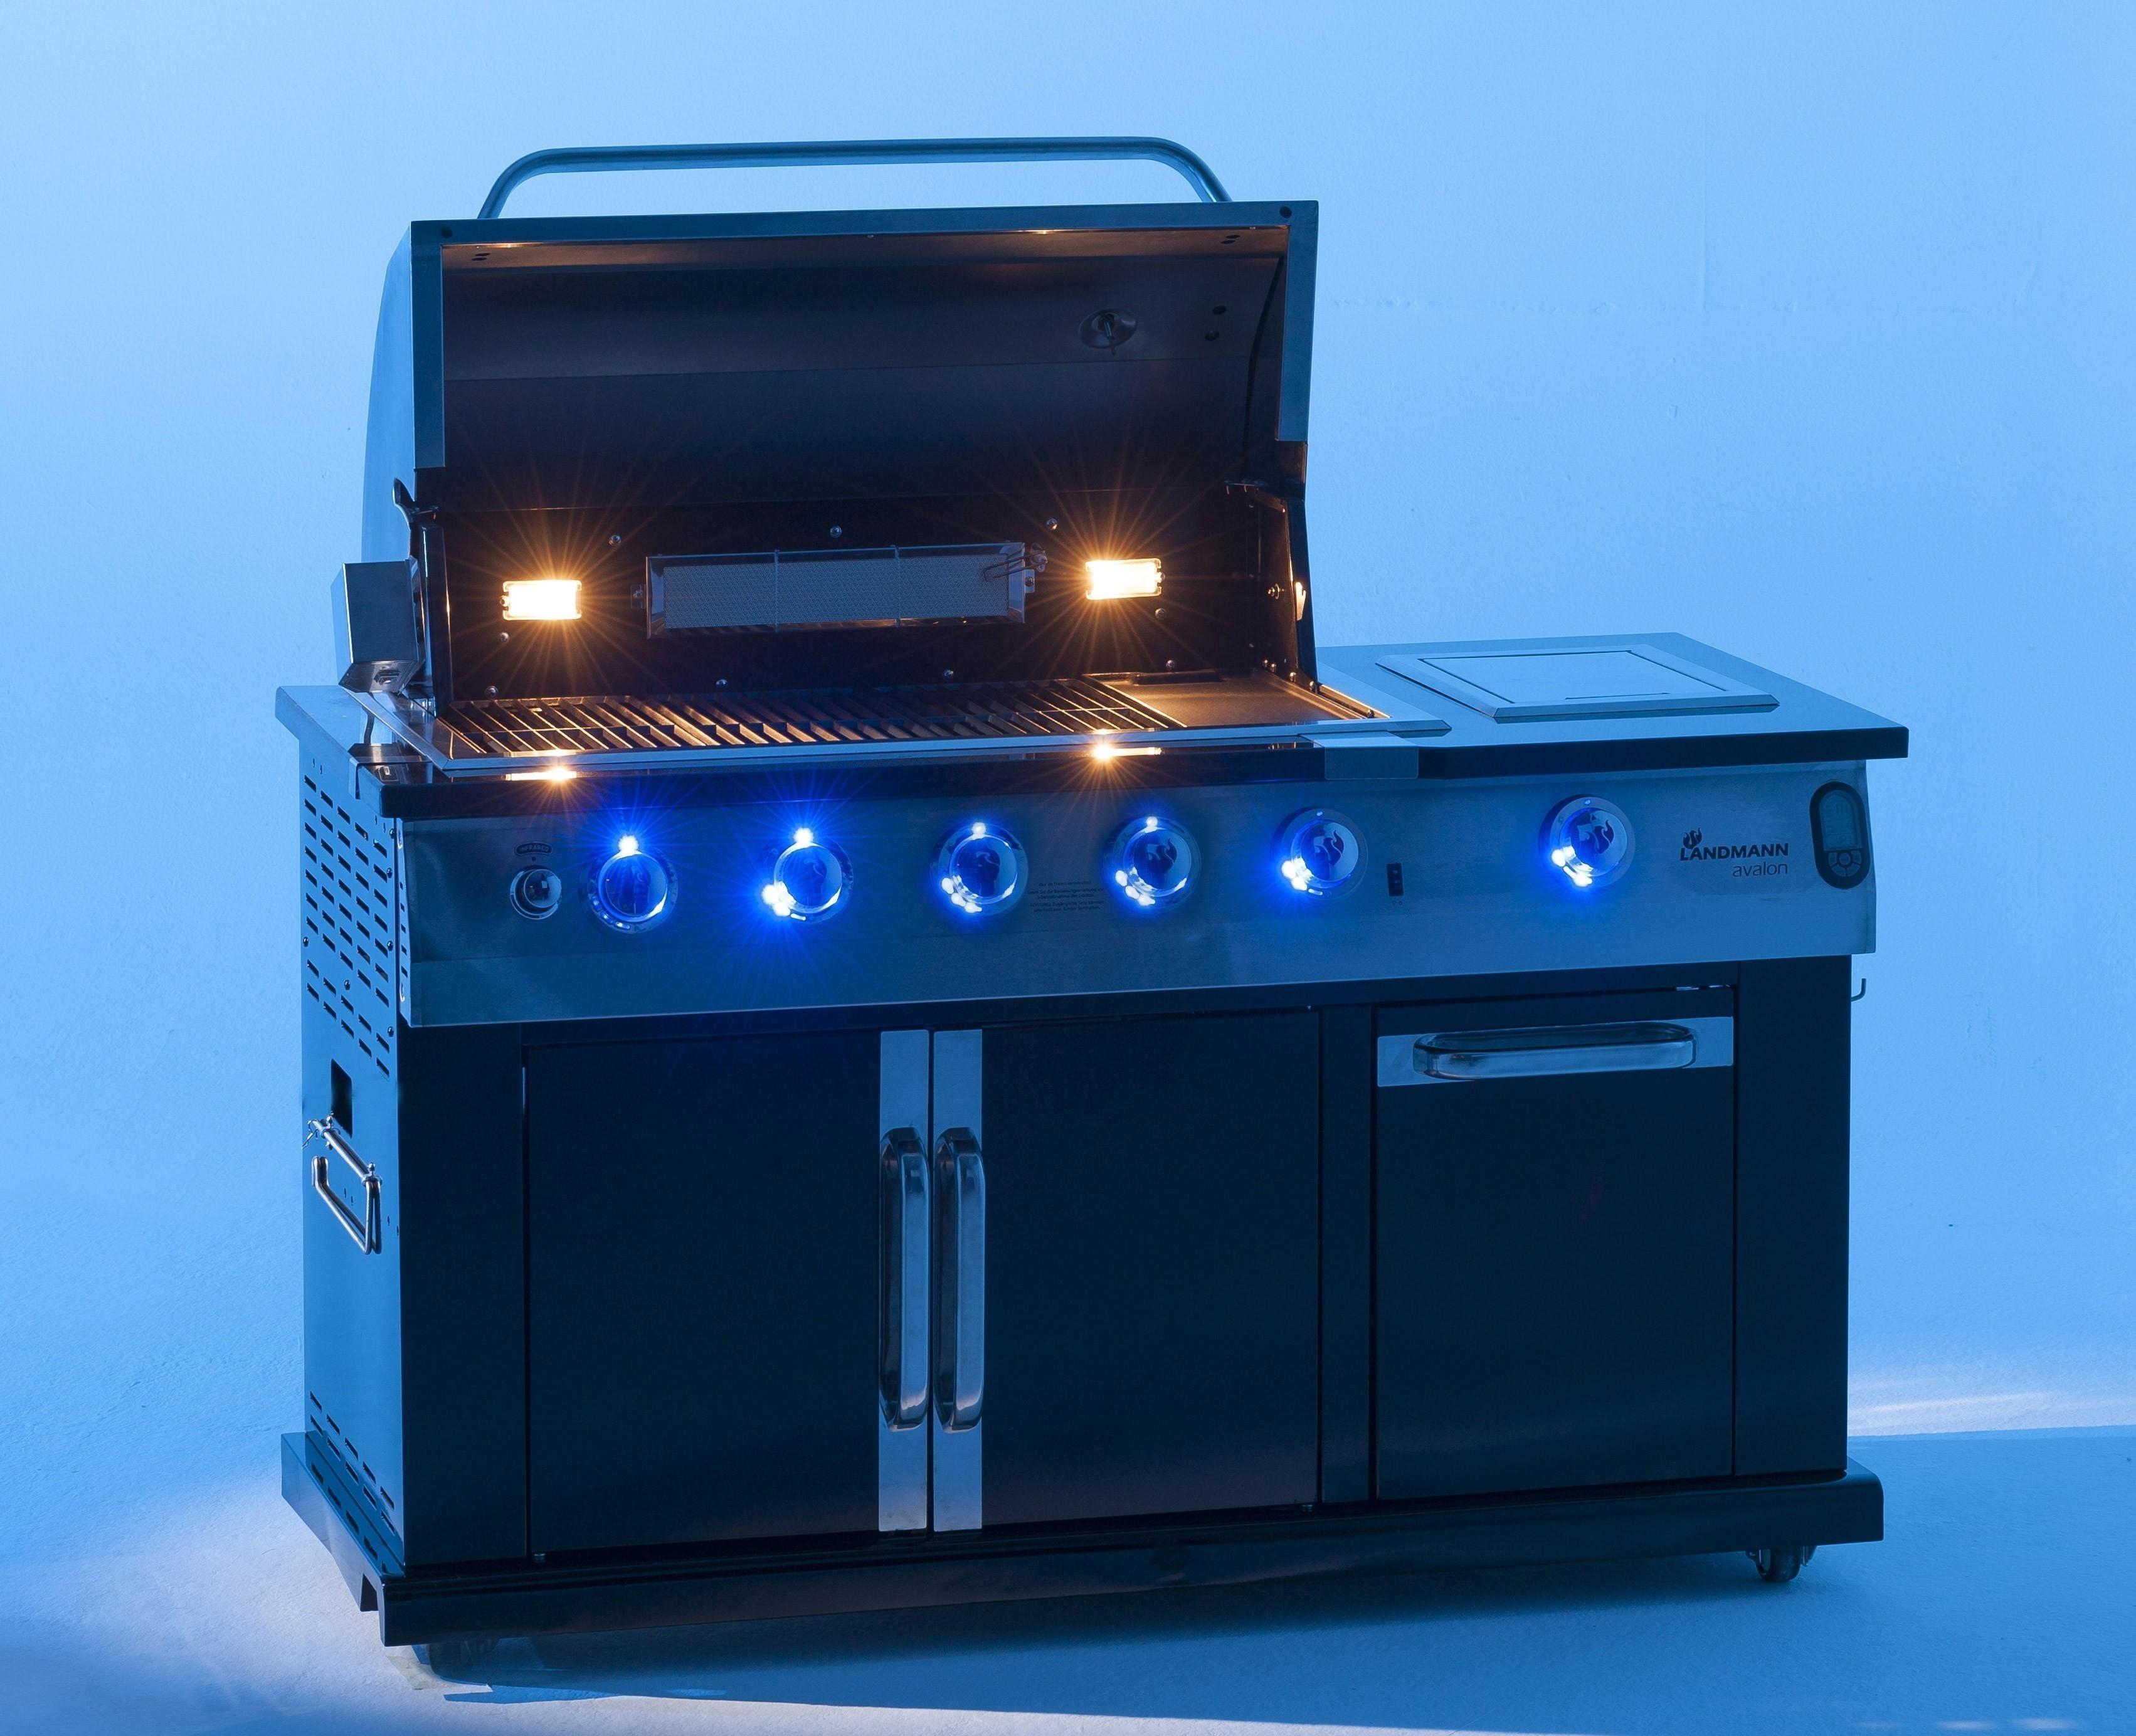 landmann grillwagen outdoor k che gasgrillk che avalon pts 6 1 12780 bei On landmann outdoor küche